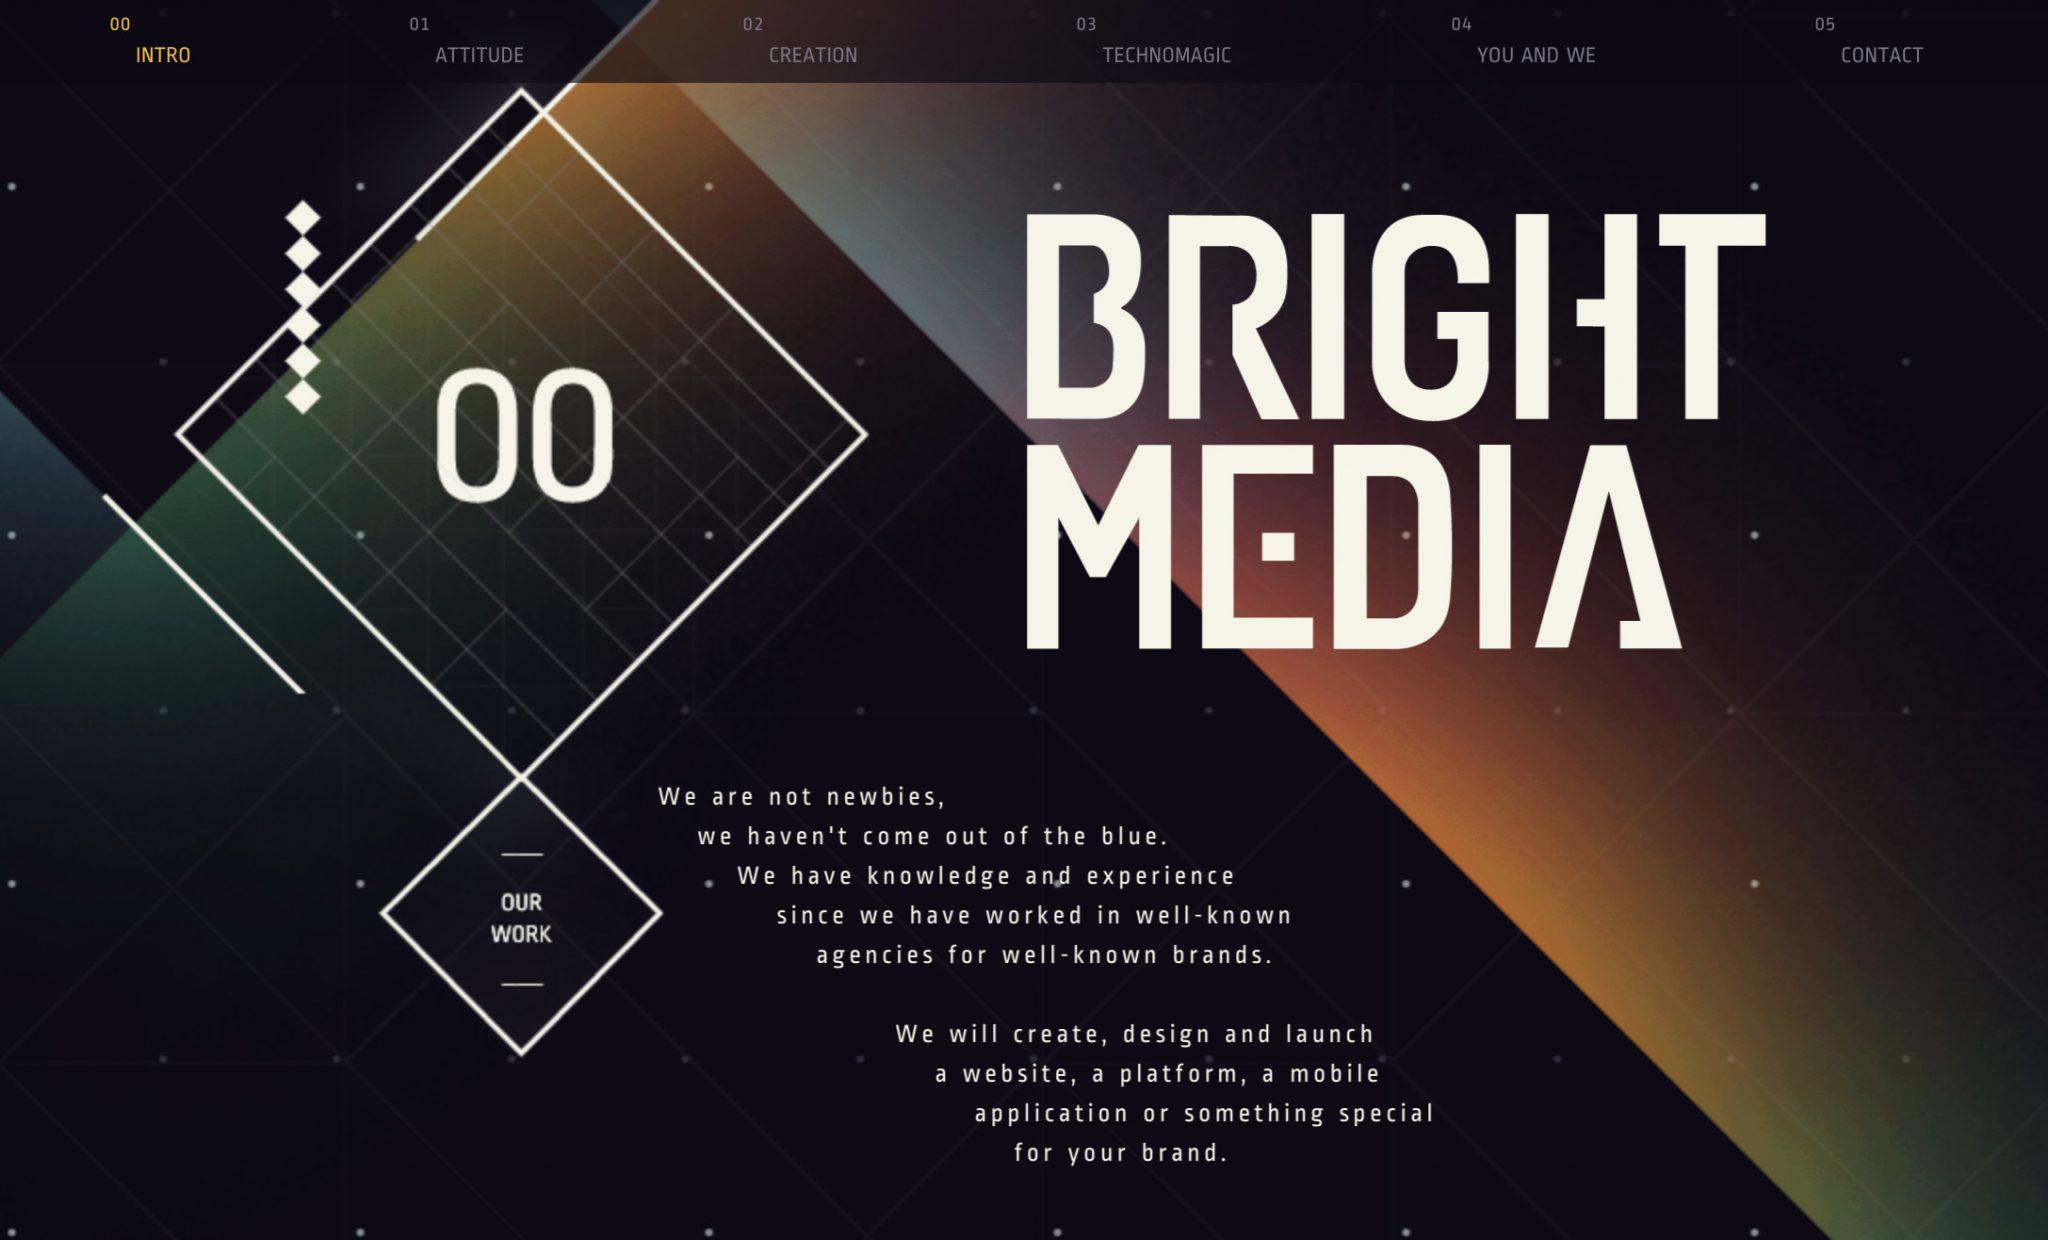 Poster design inspiration 2015 - Poster Design Inspiration 2015 56